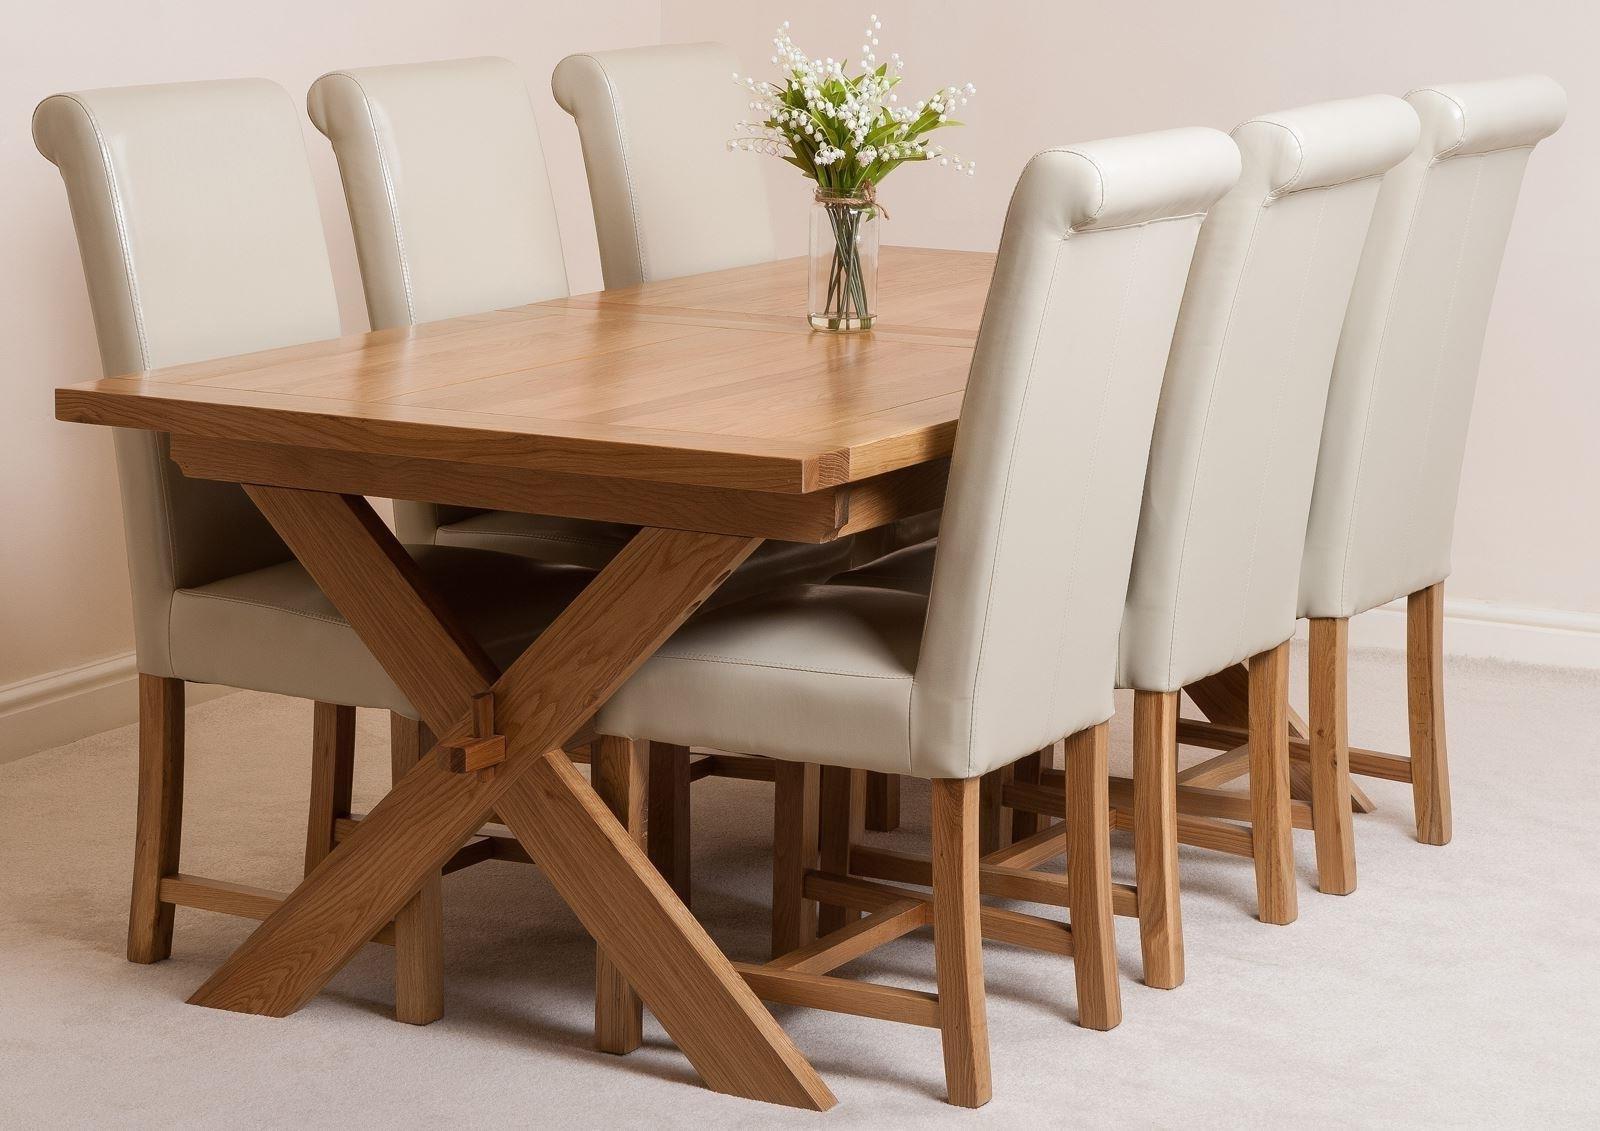 Oak Furniture King (View 13 of 25)